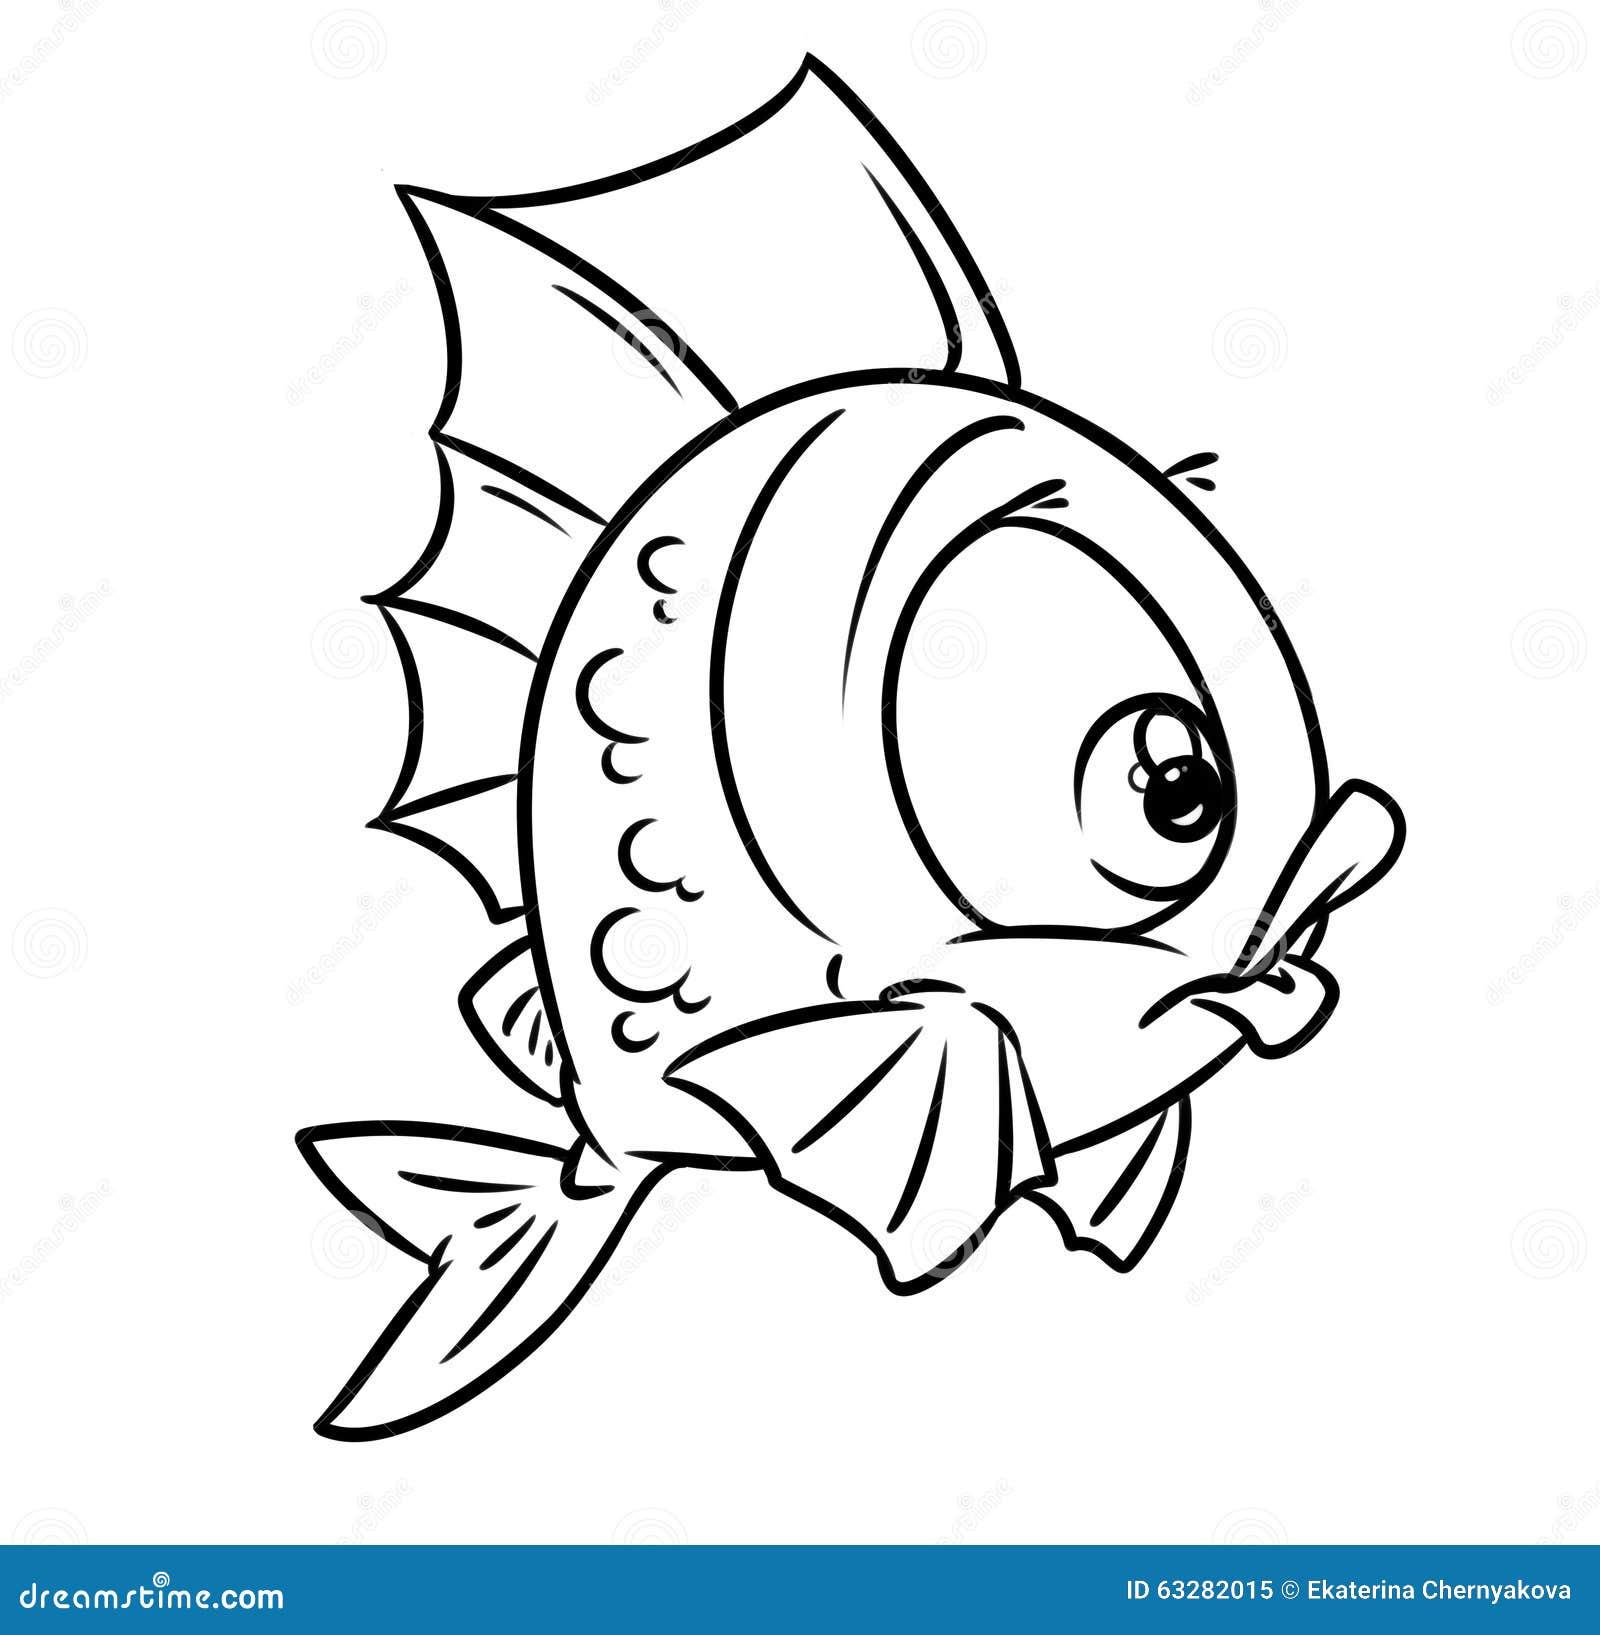 Coloring Fish Ball Cartoon Illustration Stock Illustration ...